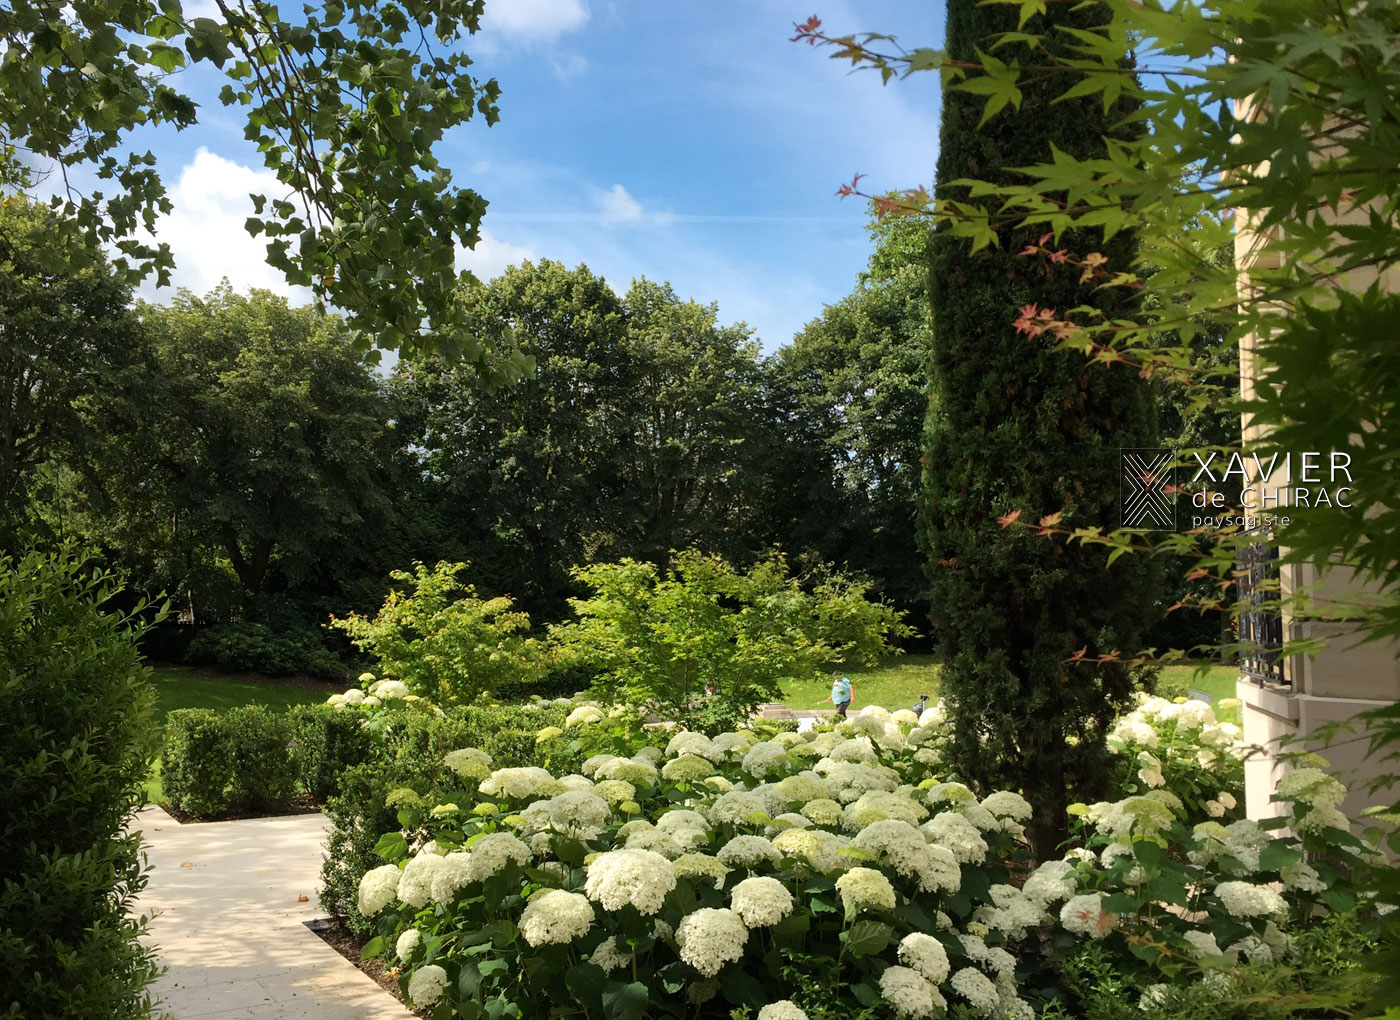 Xavier de Chirac paysagiste : jardin classique